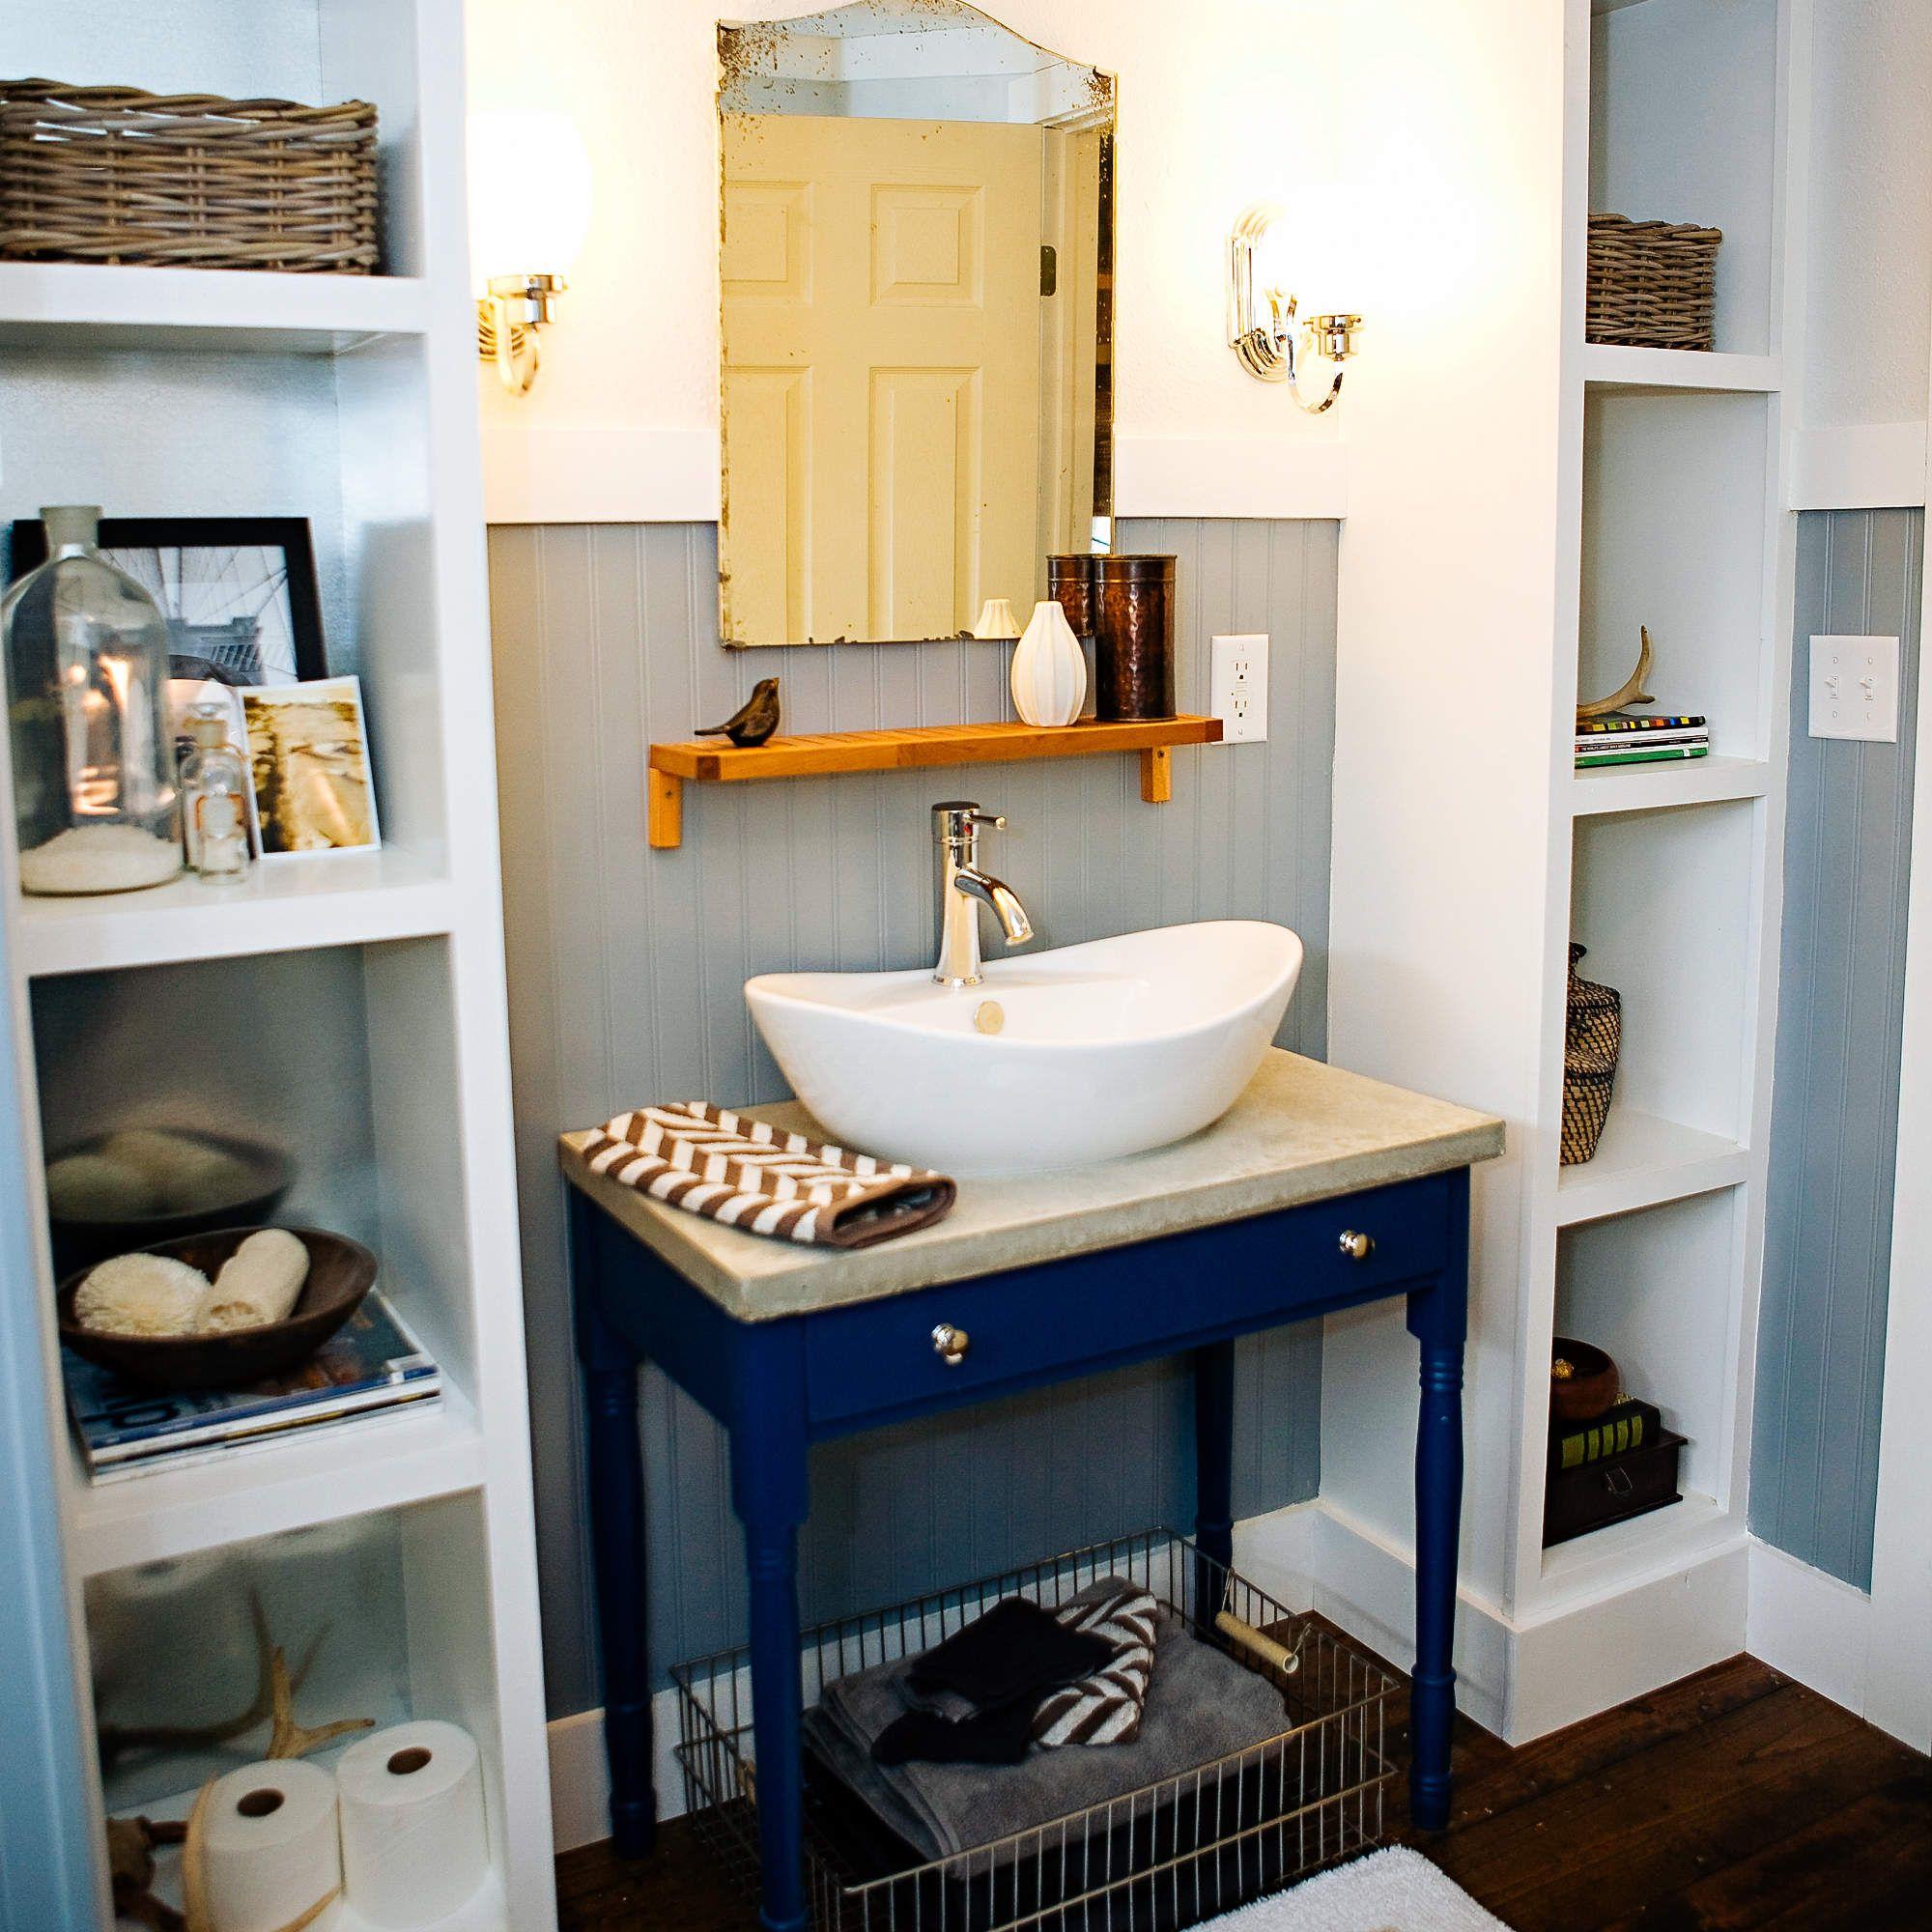 15 Genius Ikea Hacks To Turn Your Bathroom Into A Palace Ikea Bathroom Restroom Renovation Bathroom Hacks